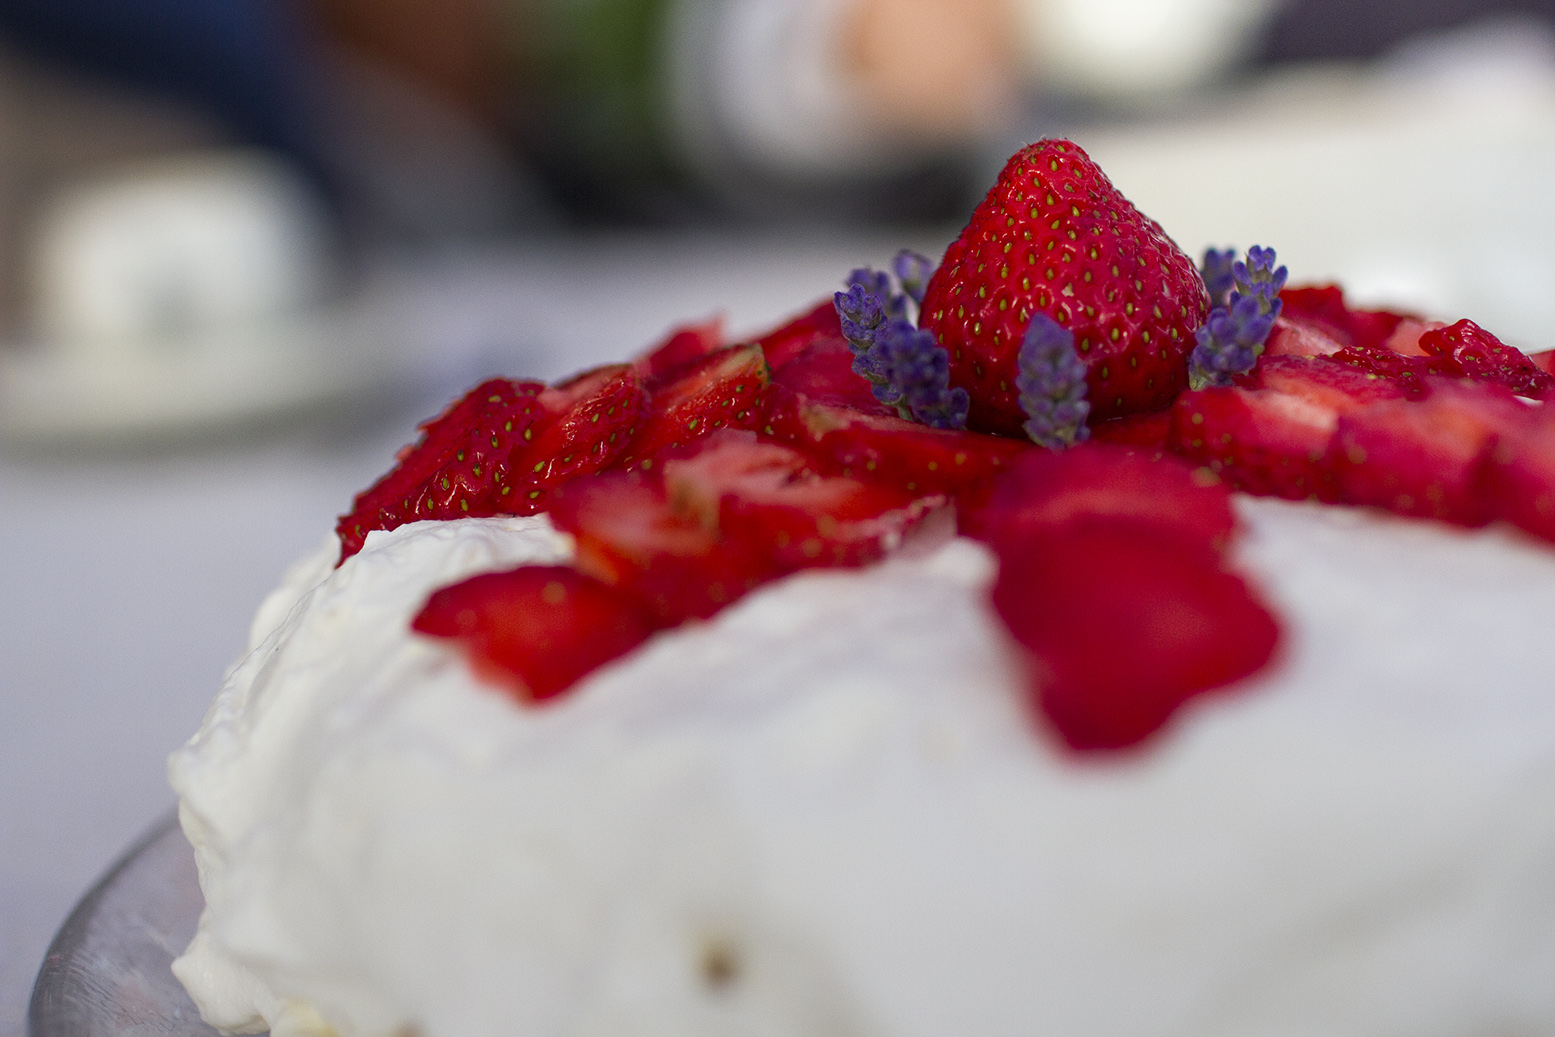 sommar hälsingland jordgubbstårta IMG_7758